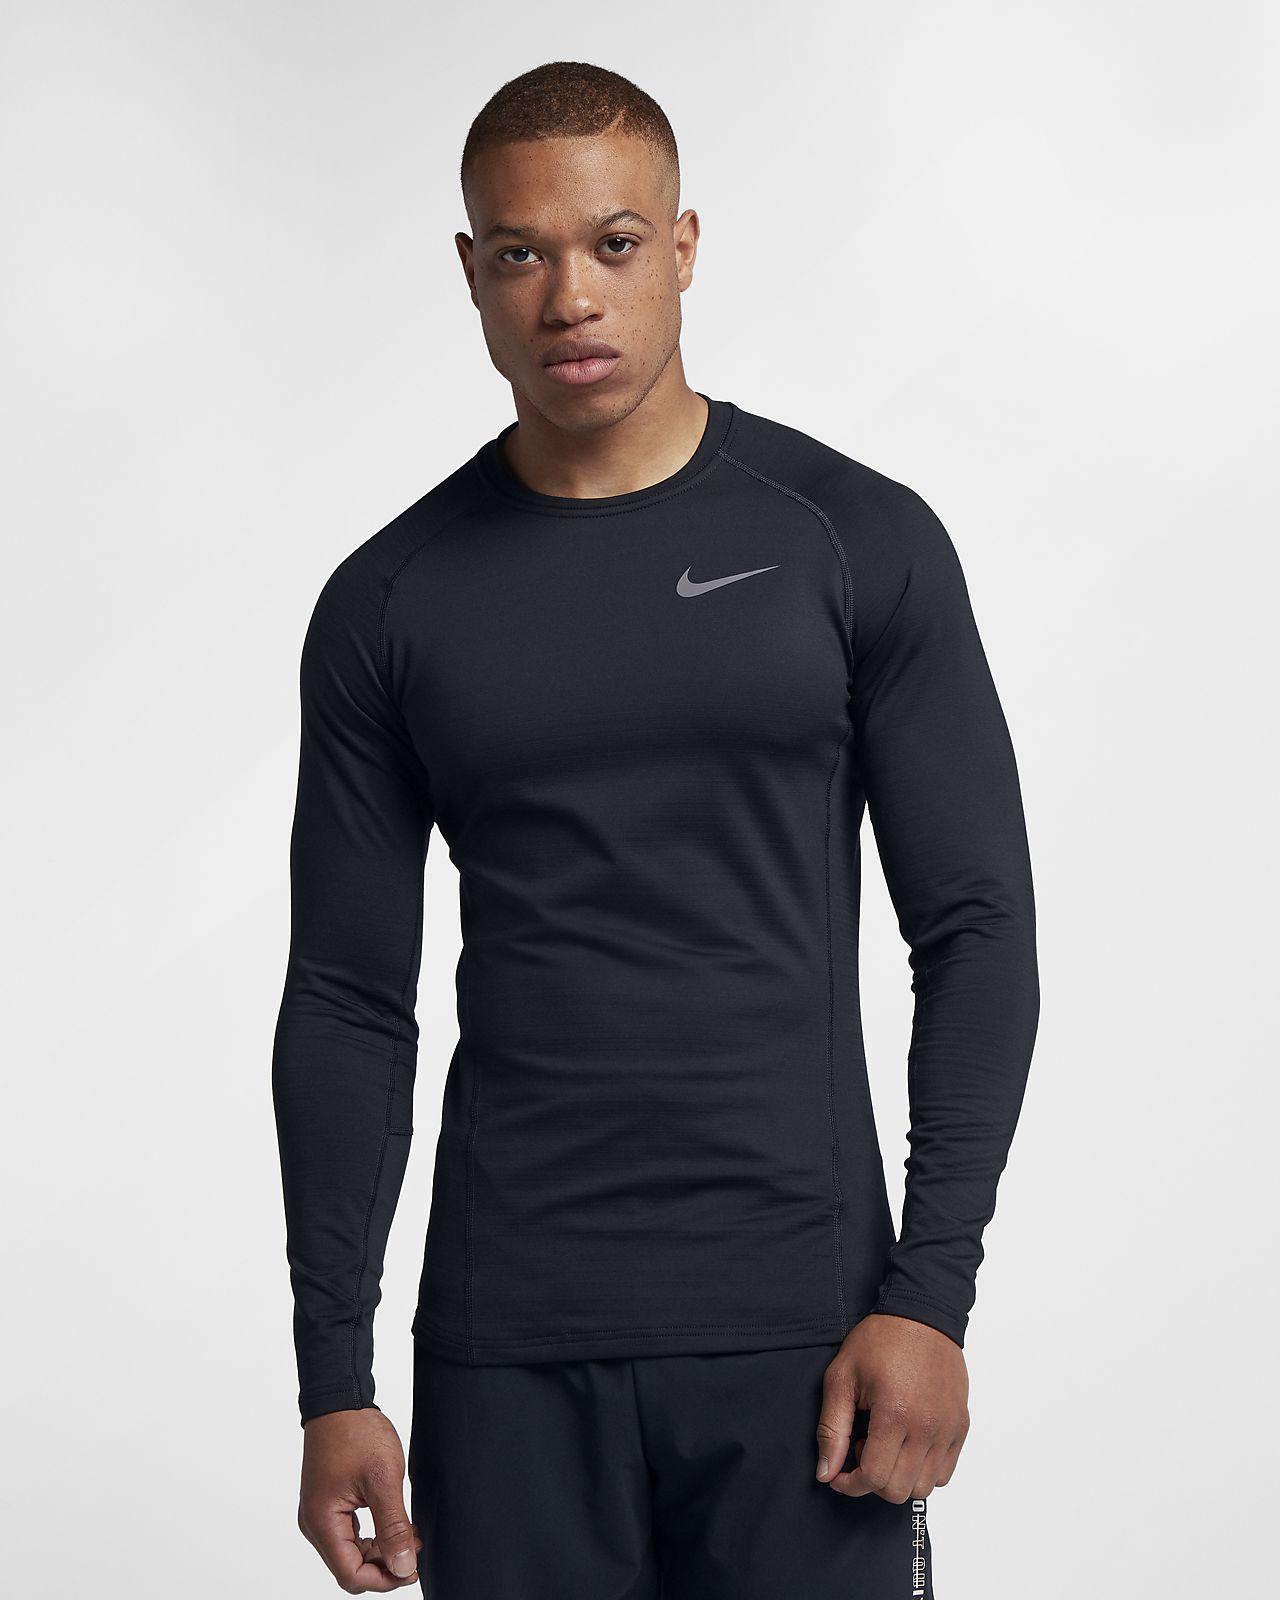 Nike Pro Warm Men's Long-Sleeve Training Top